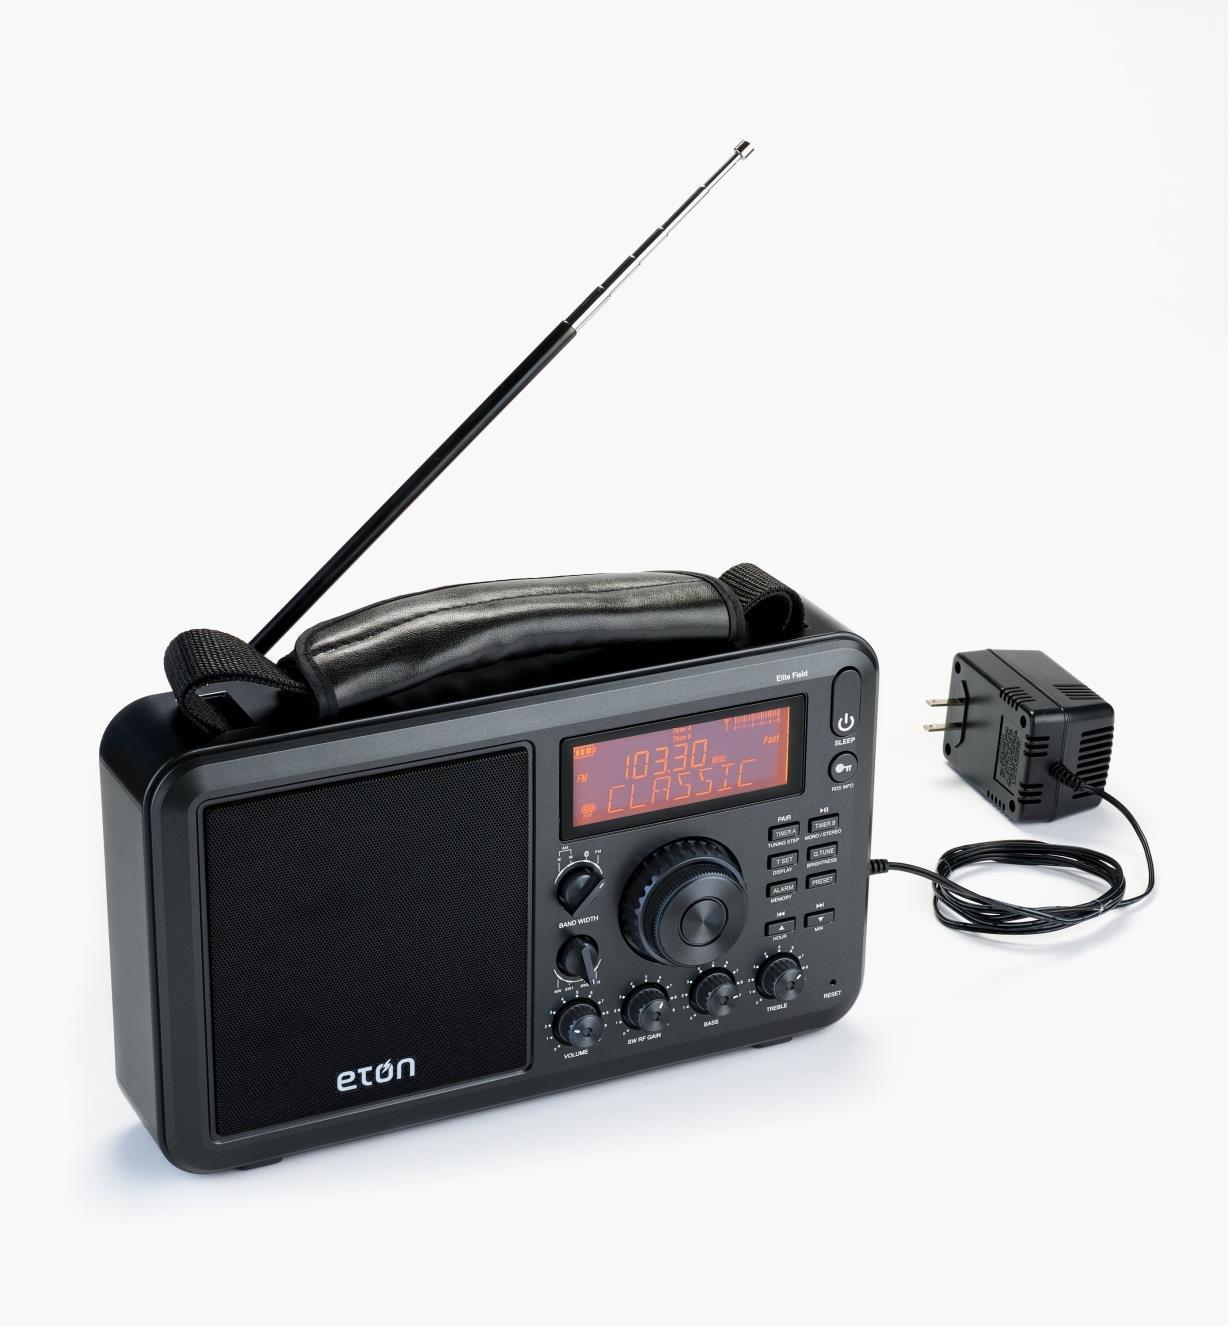 KC538 - Eton AM/FM Shortwave Radio